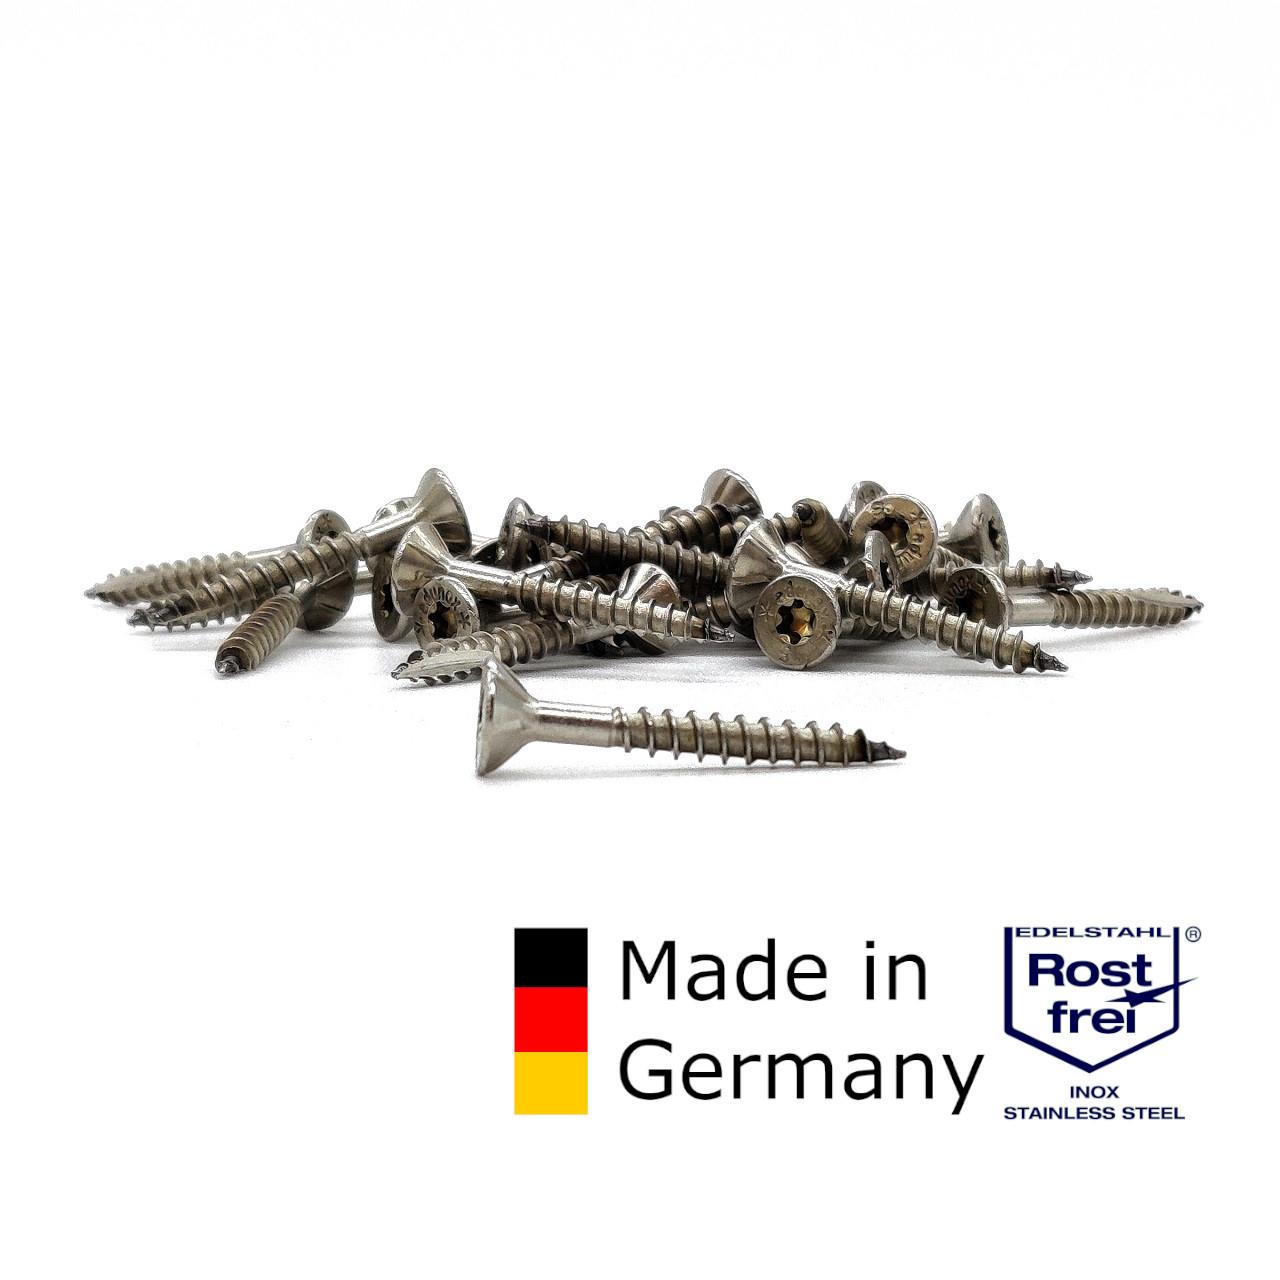 adunox Schieferschrauben | rostfrei A2 | 4,0x32 | 500 Stk